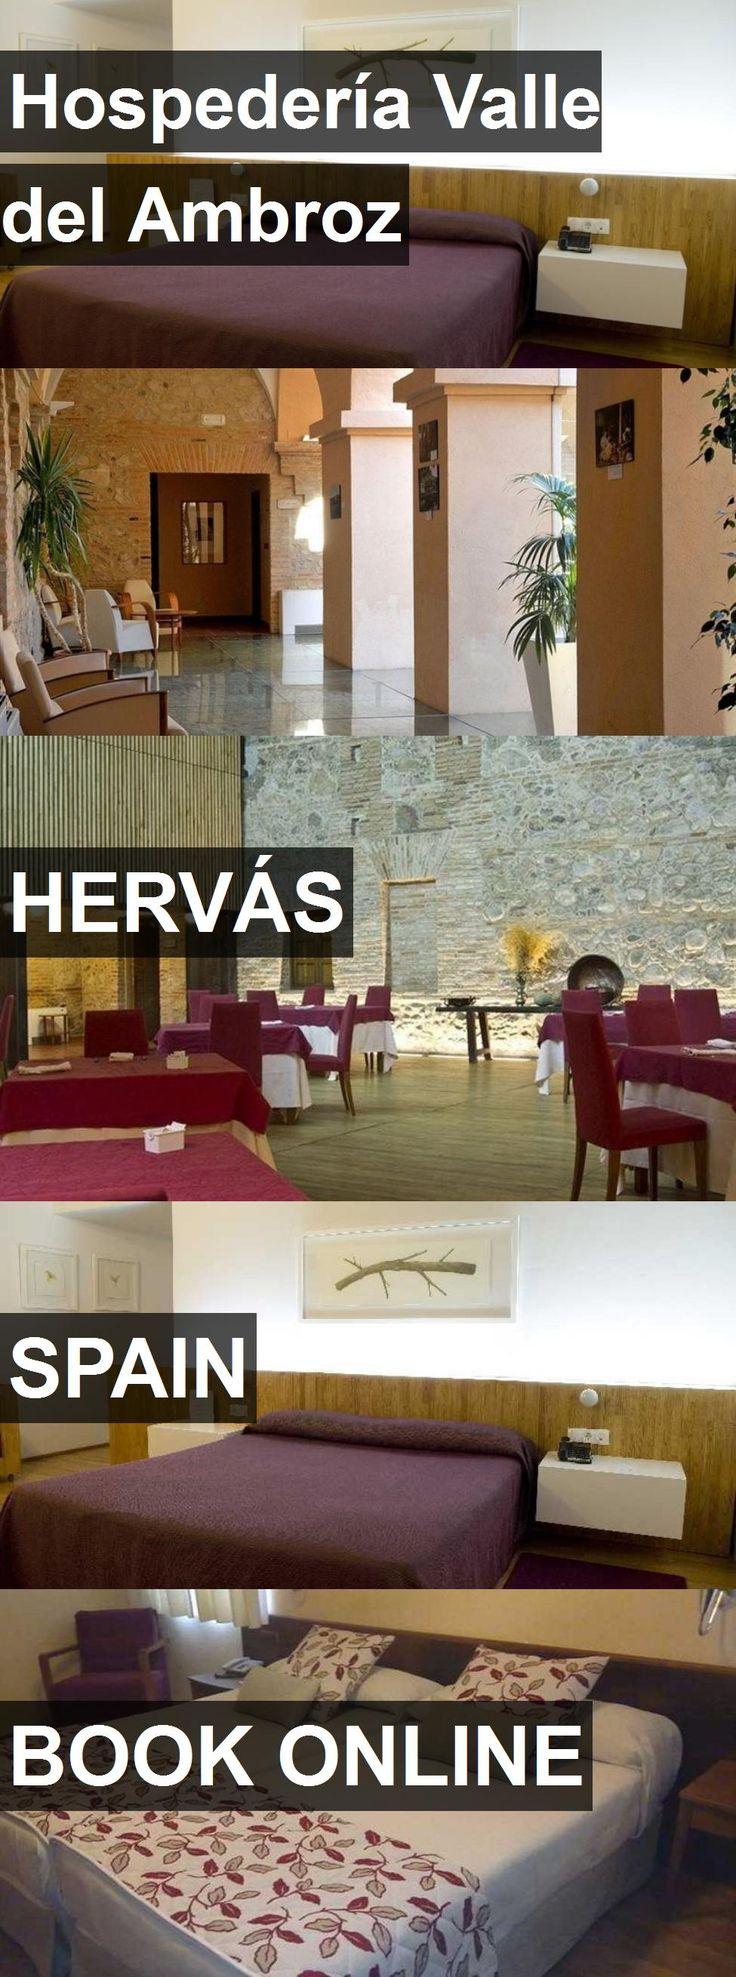 Hotel Hospedería Valle del Ambroz in Hervás, Spain. For more information, photos, reviews and best prices please follow the link. #Spain #Hervás #HospederíaValledelAmbroz #hotel #travel #vacation